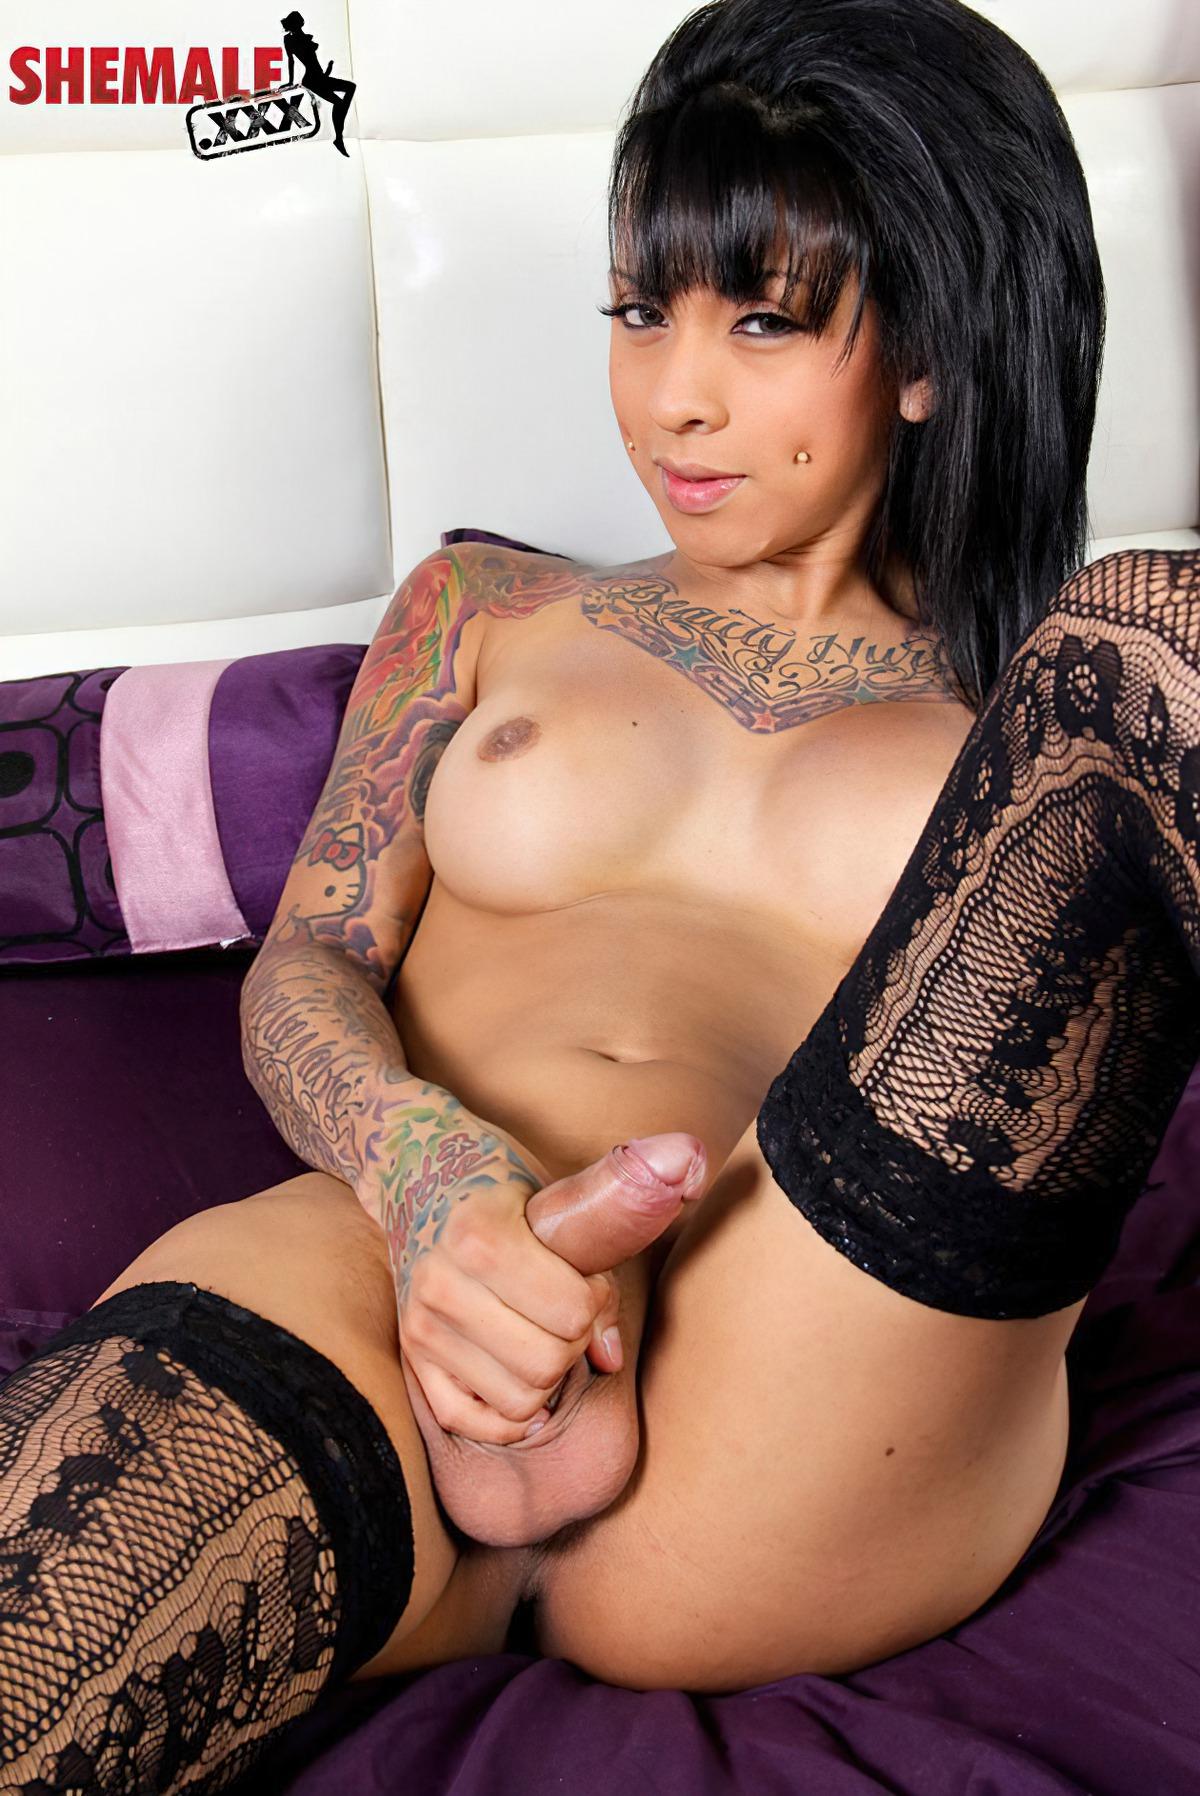 Travesti com Tatuagens (1)